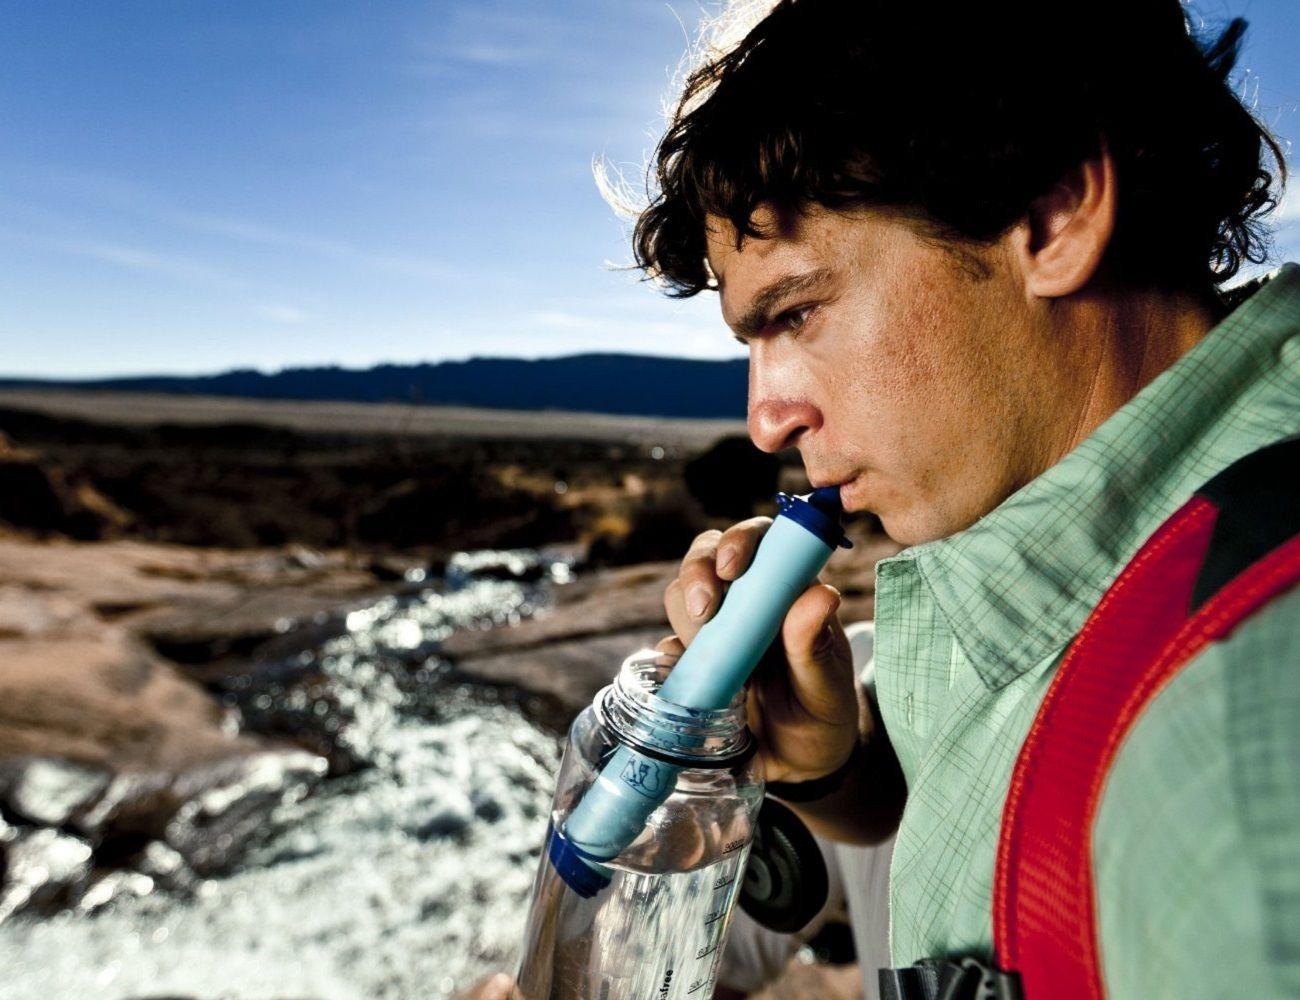 LifeStraw Emergency Water Filter